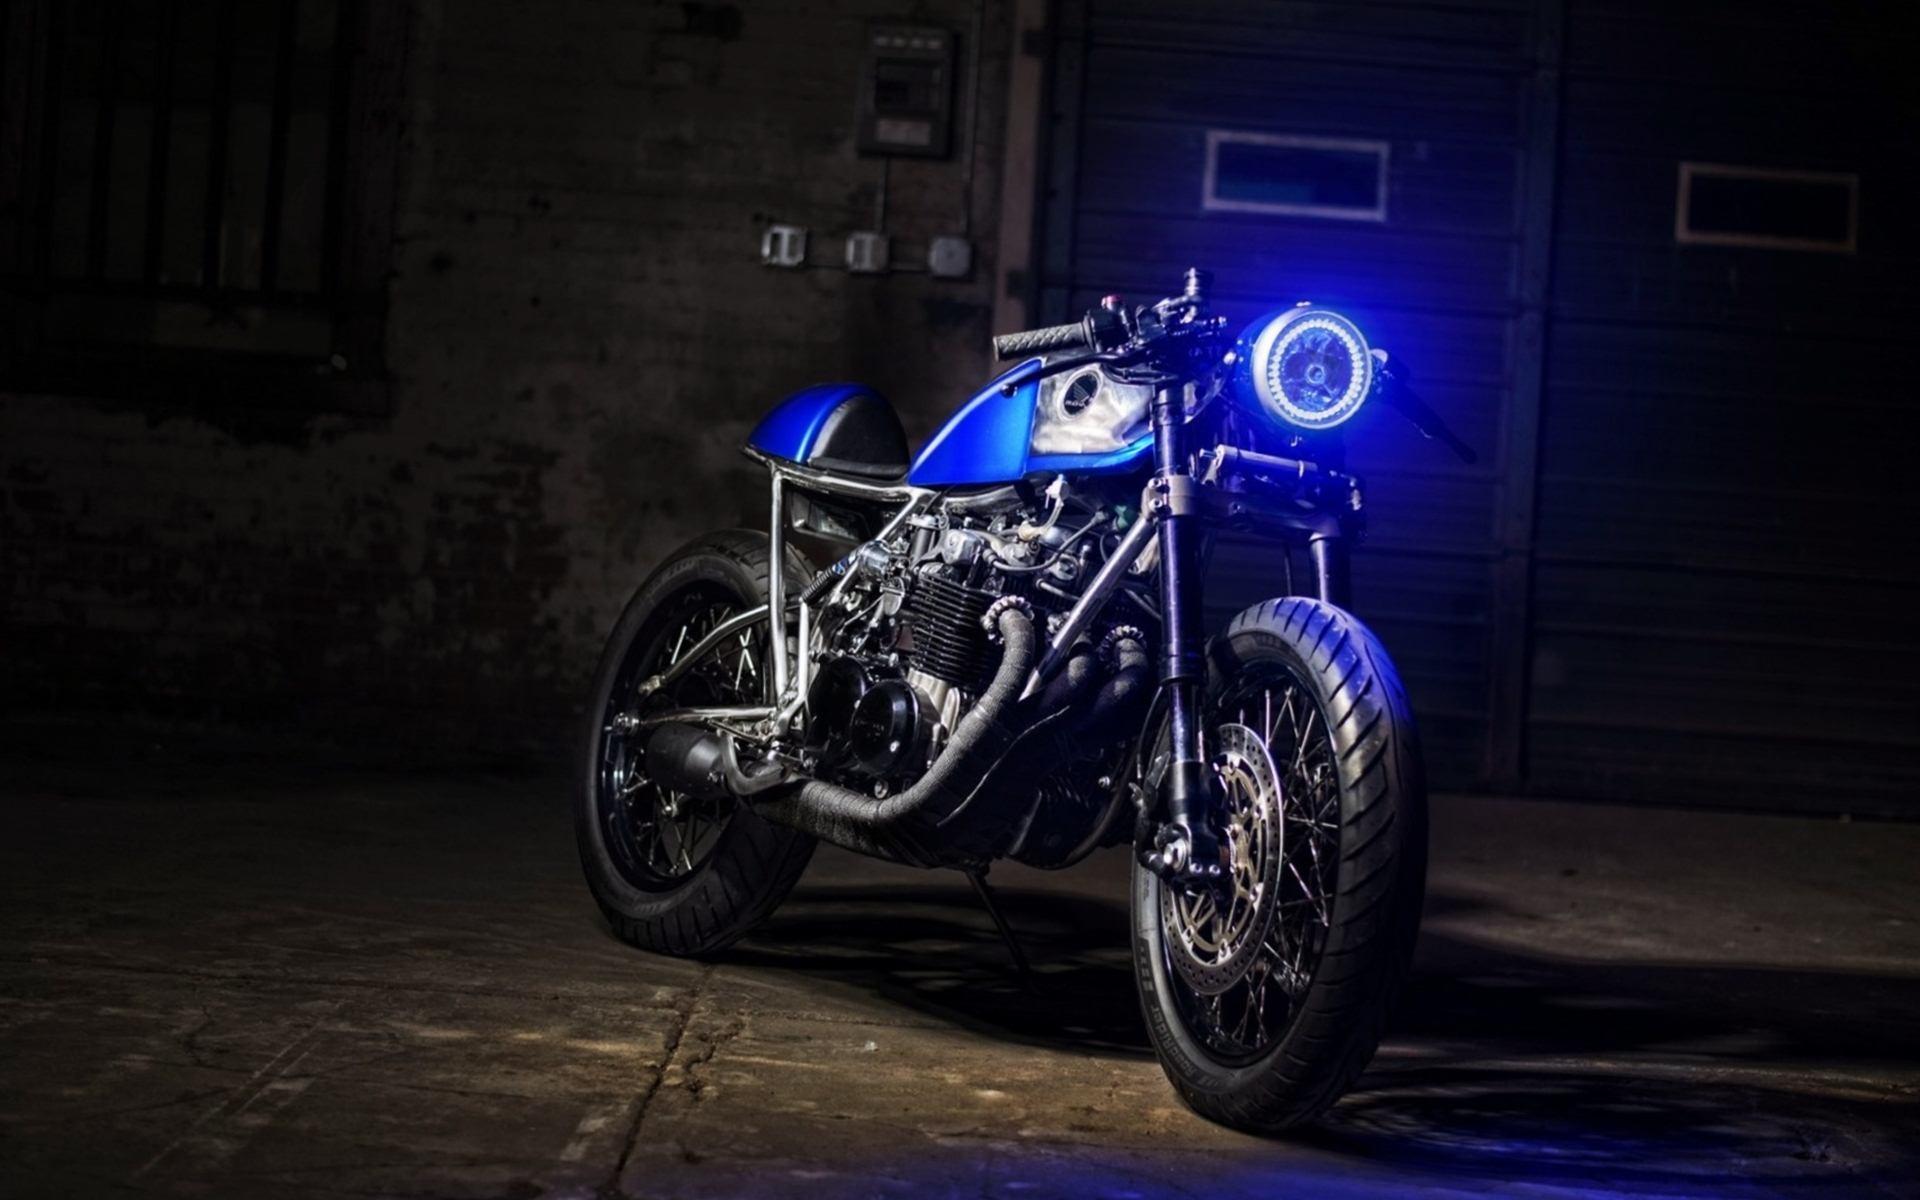 Wallpaper Car Motorcycle Photography Blue Heavy Bike